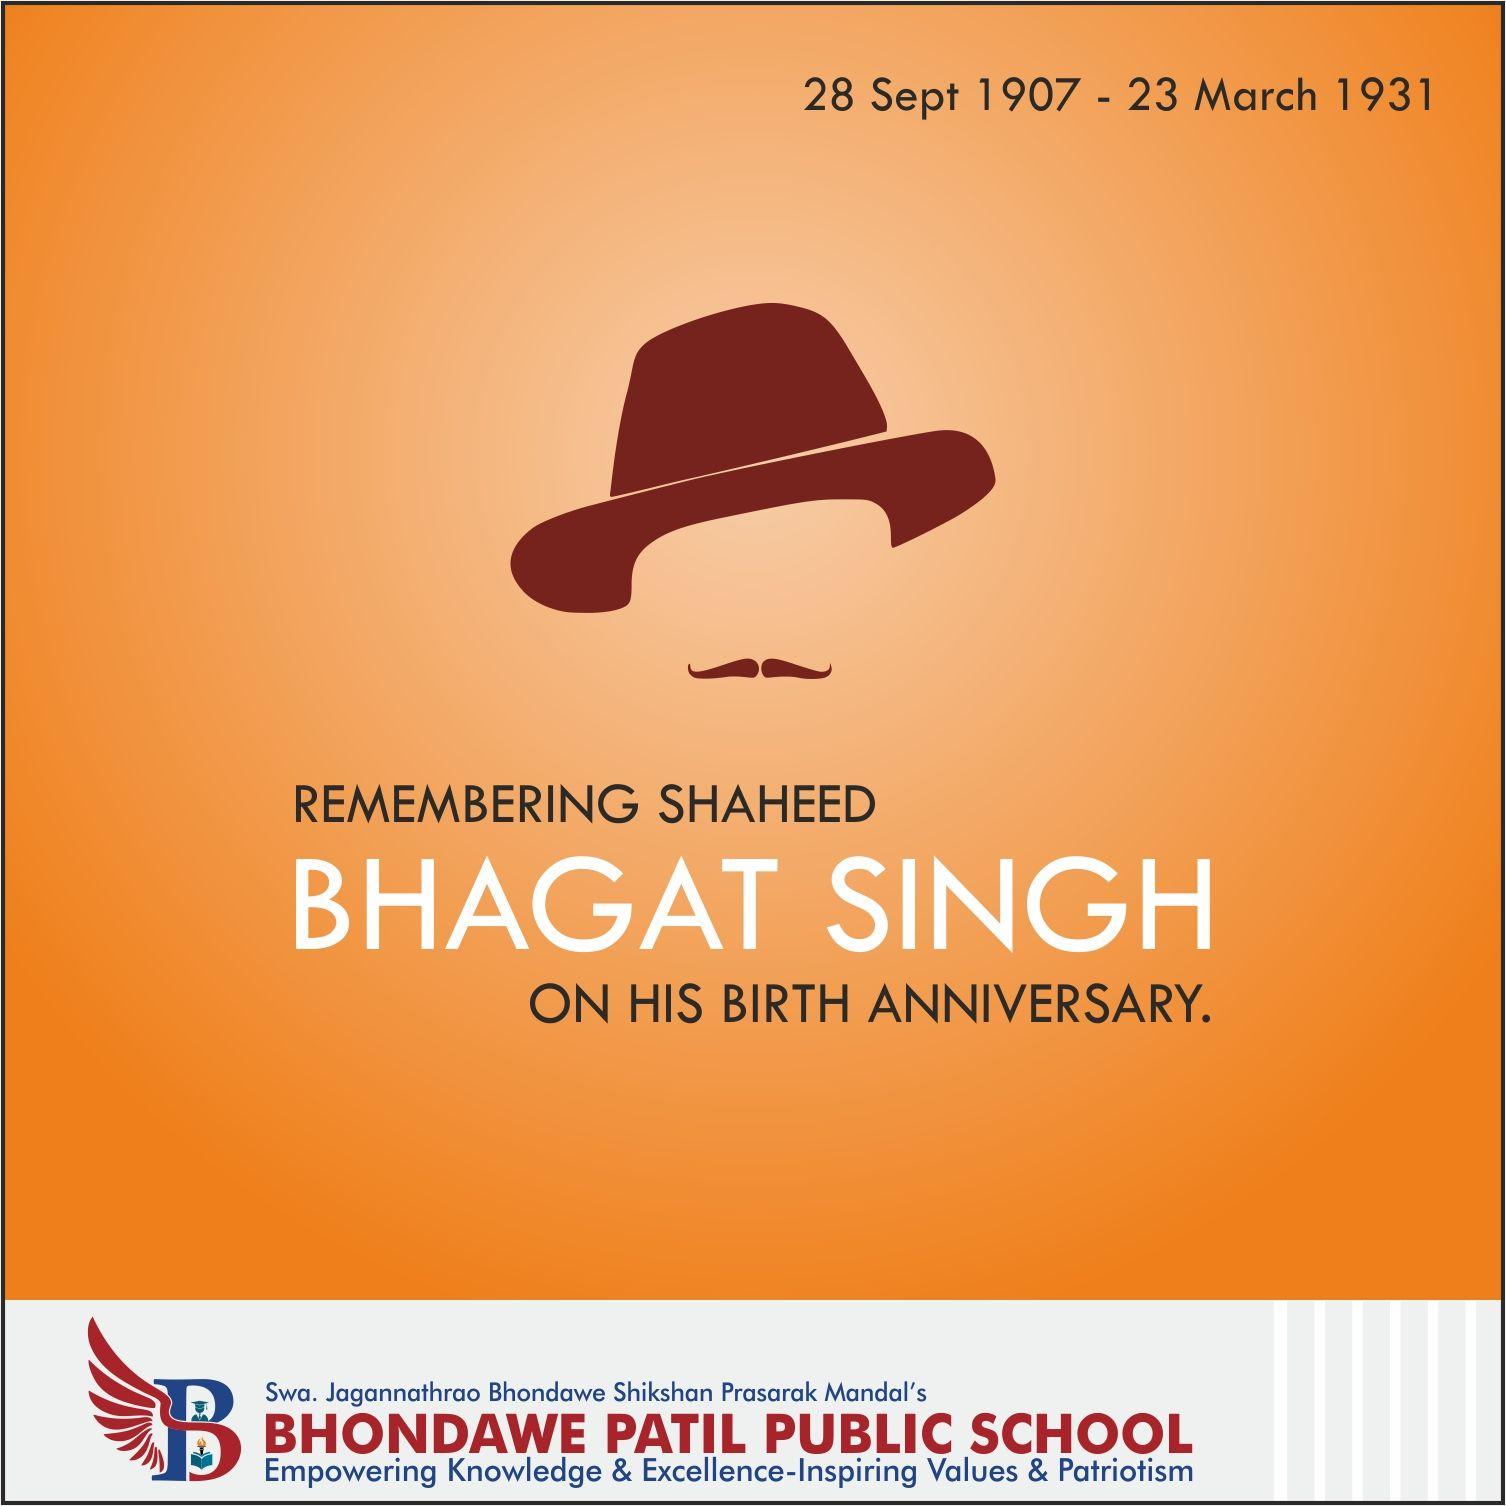 Remembering Shaheed Bhagat Singh on his Birth Anniversary